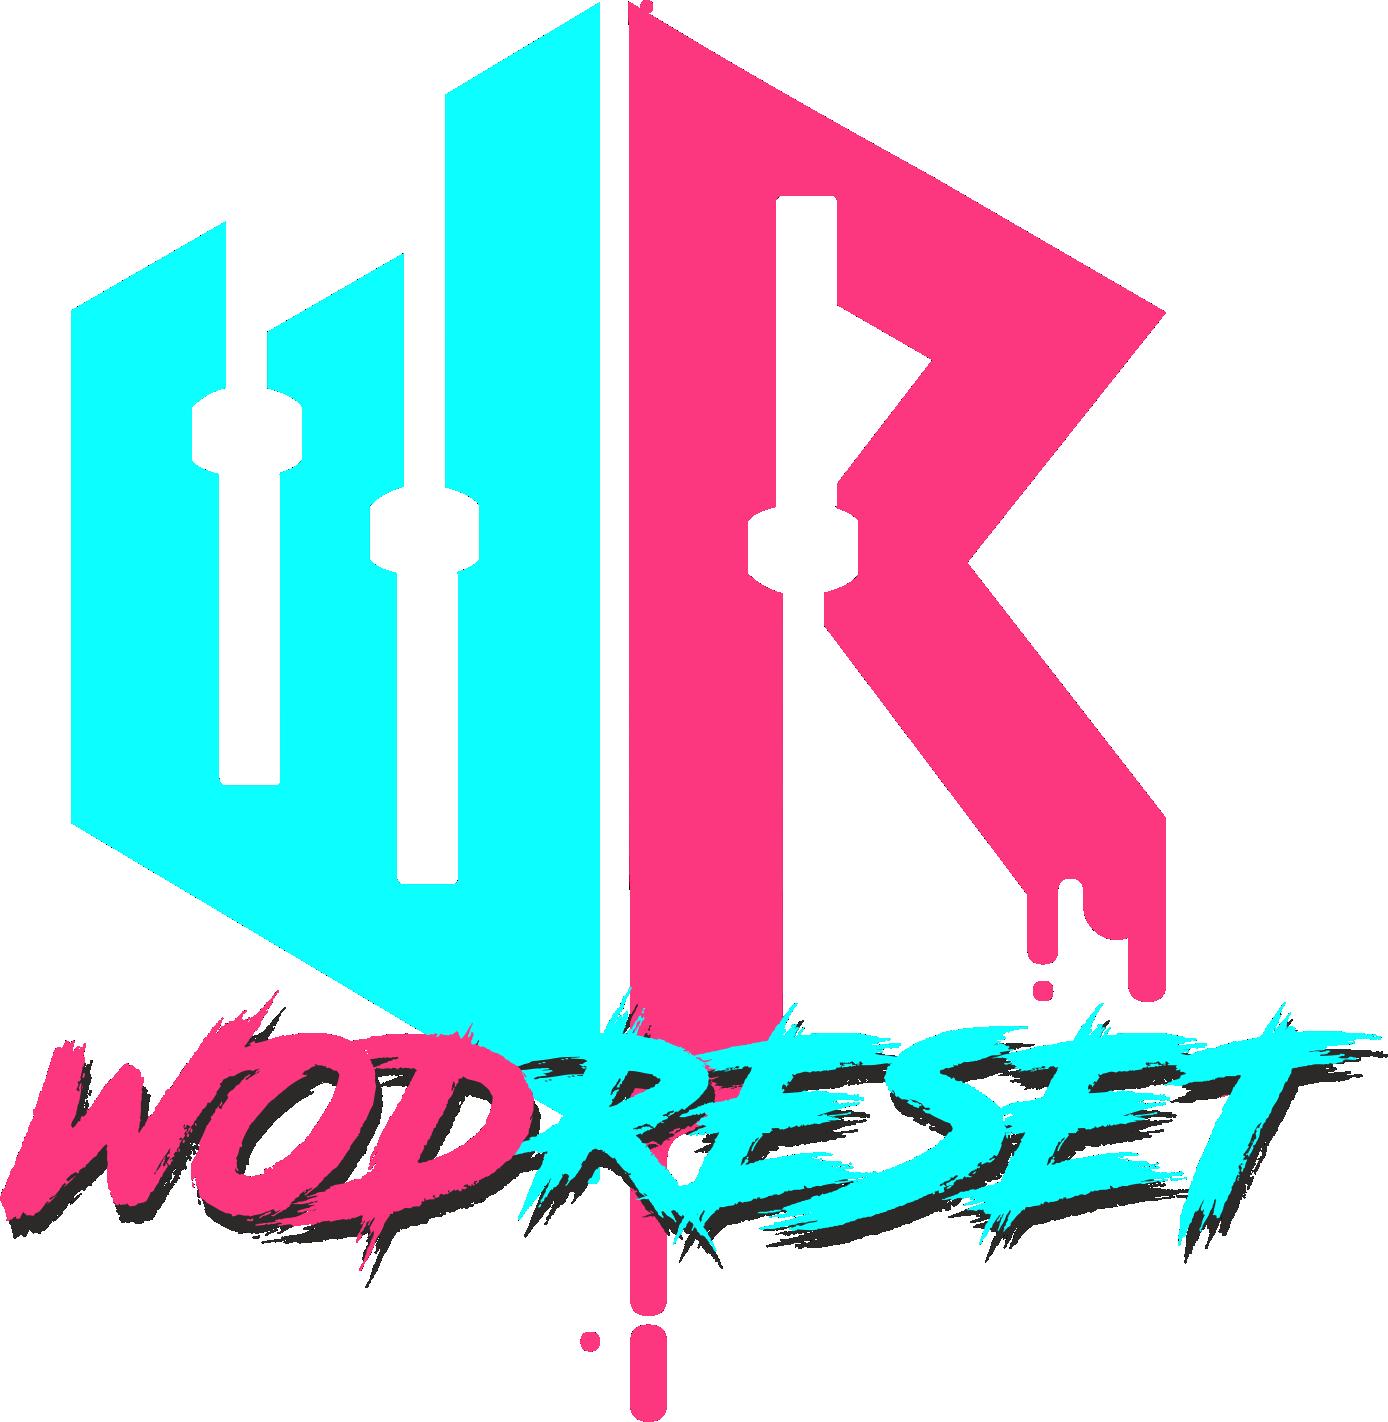 WodReset